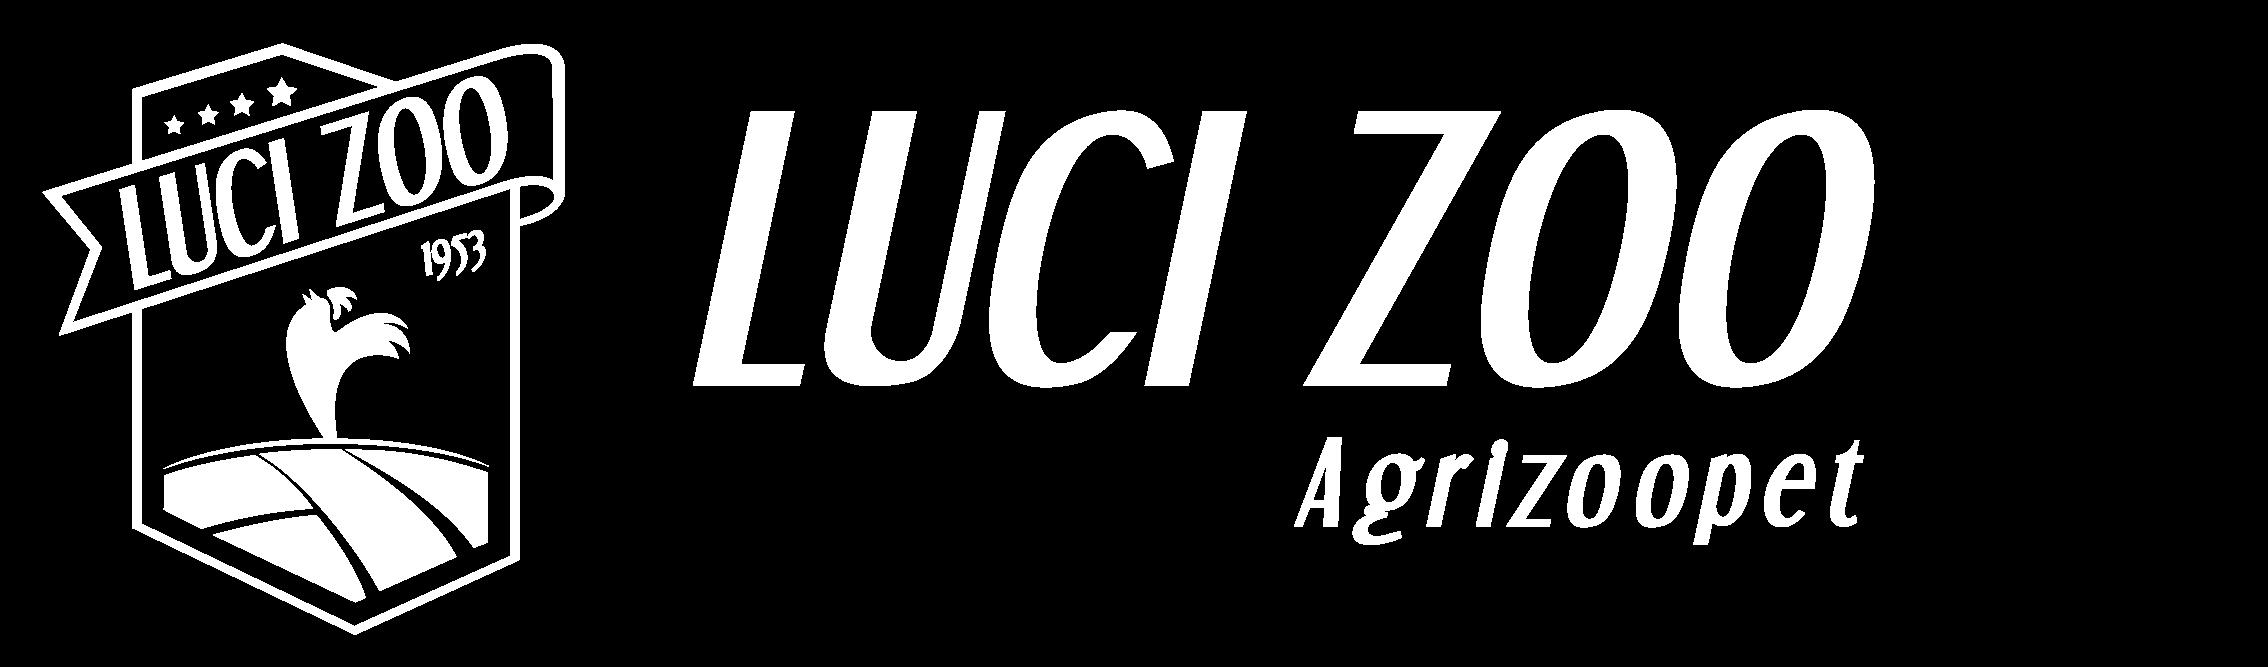 Logo Lucizoo agrizoopet